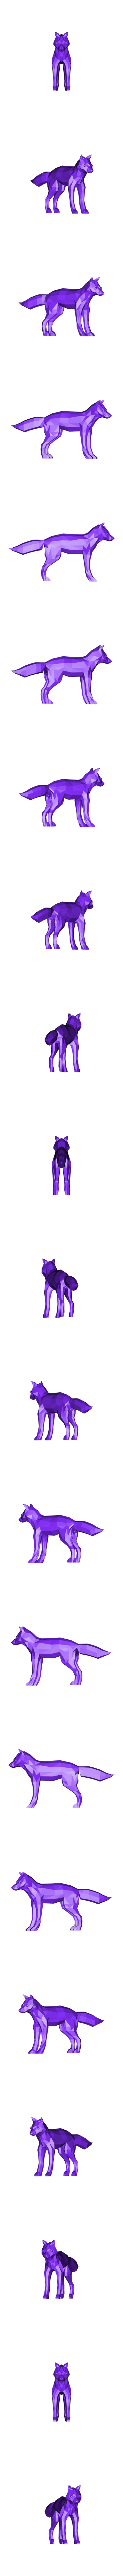 NOVELO_FOX.obj Download free OBJ file Fox • 3D printer model, Colorful3D